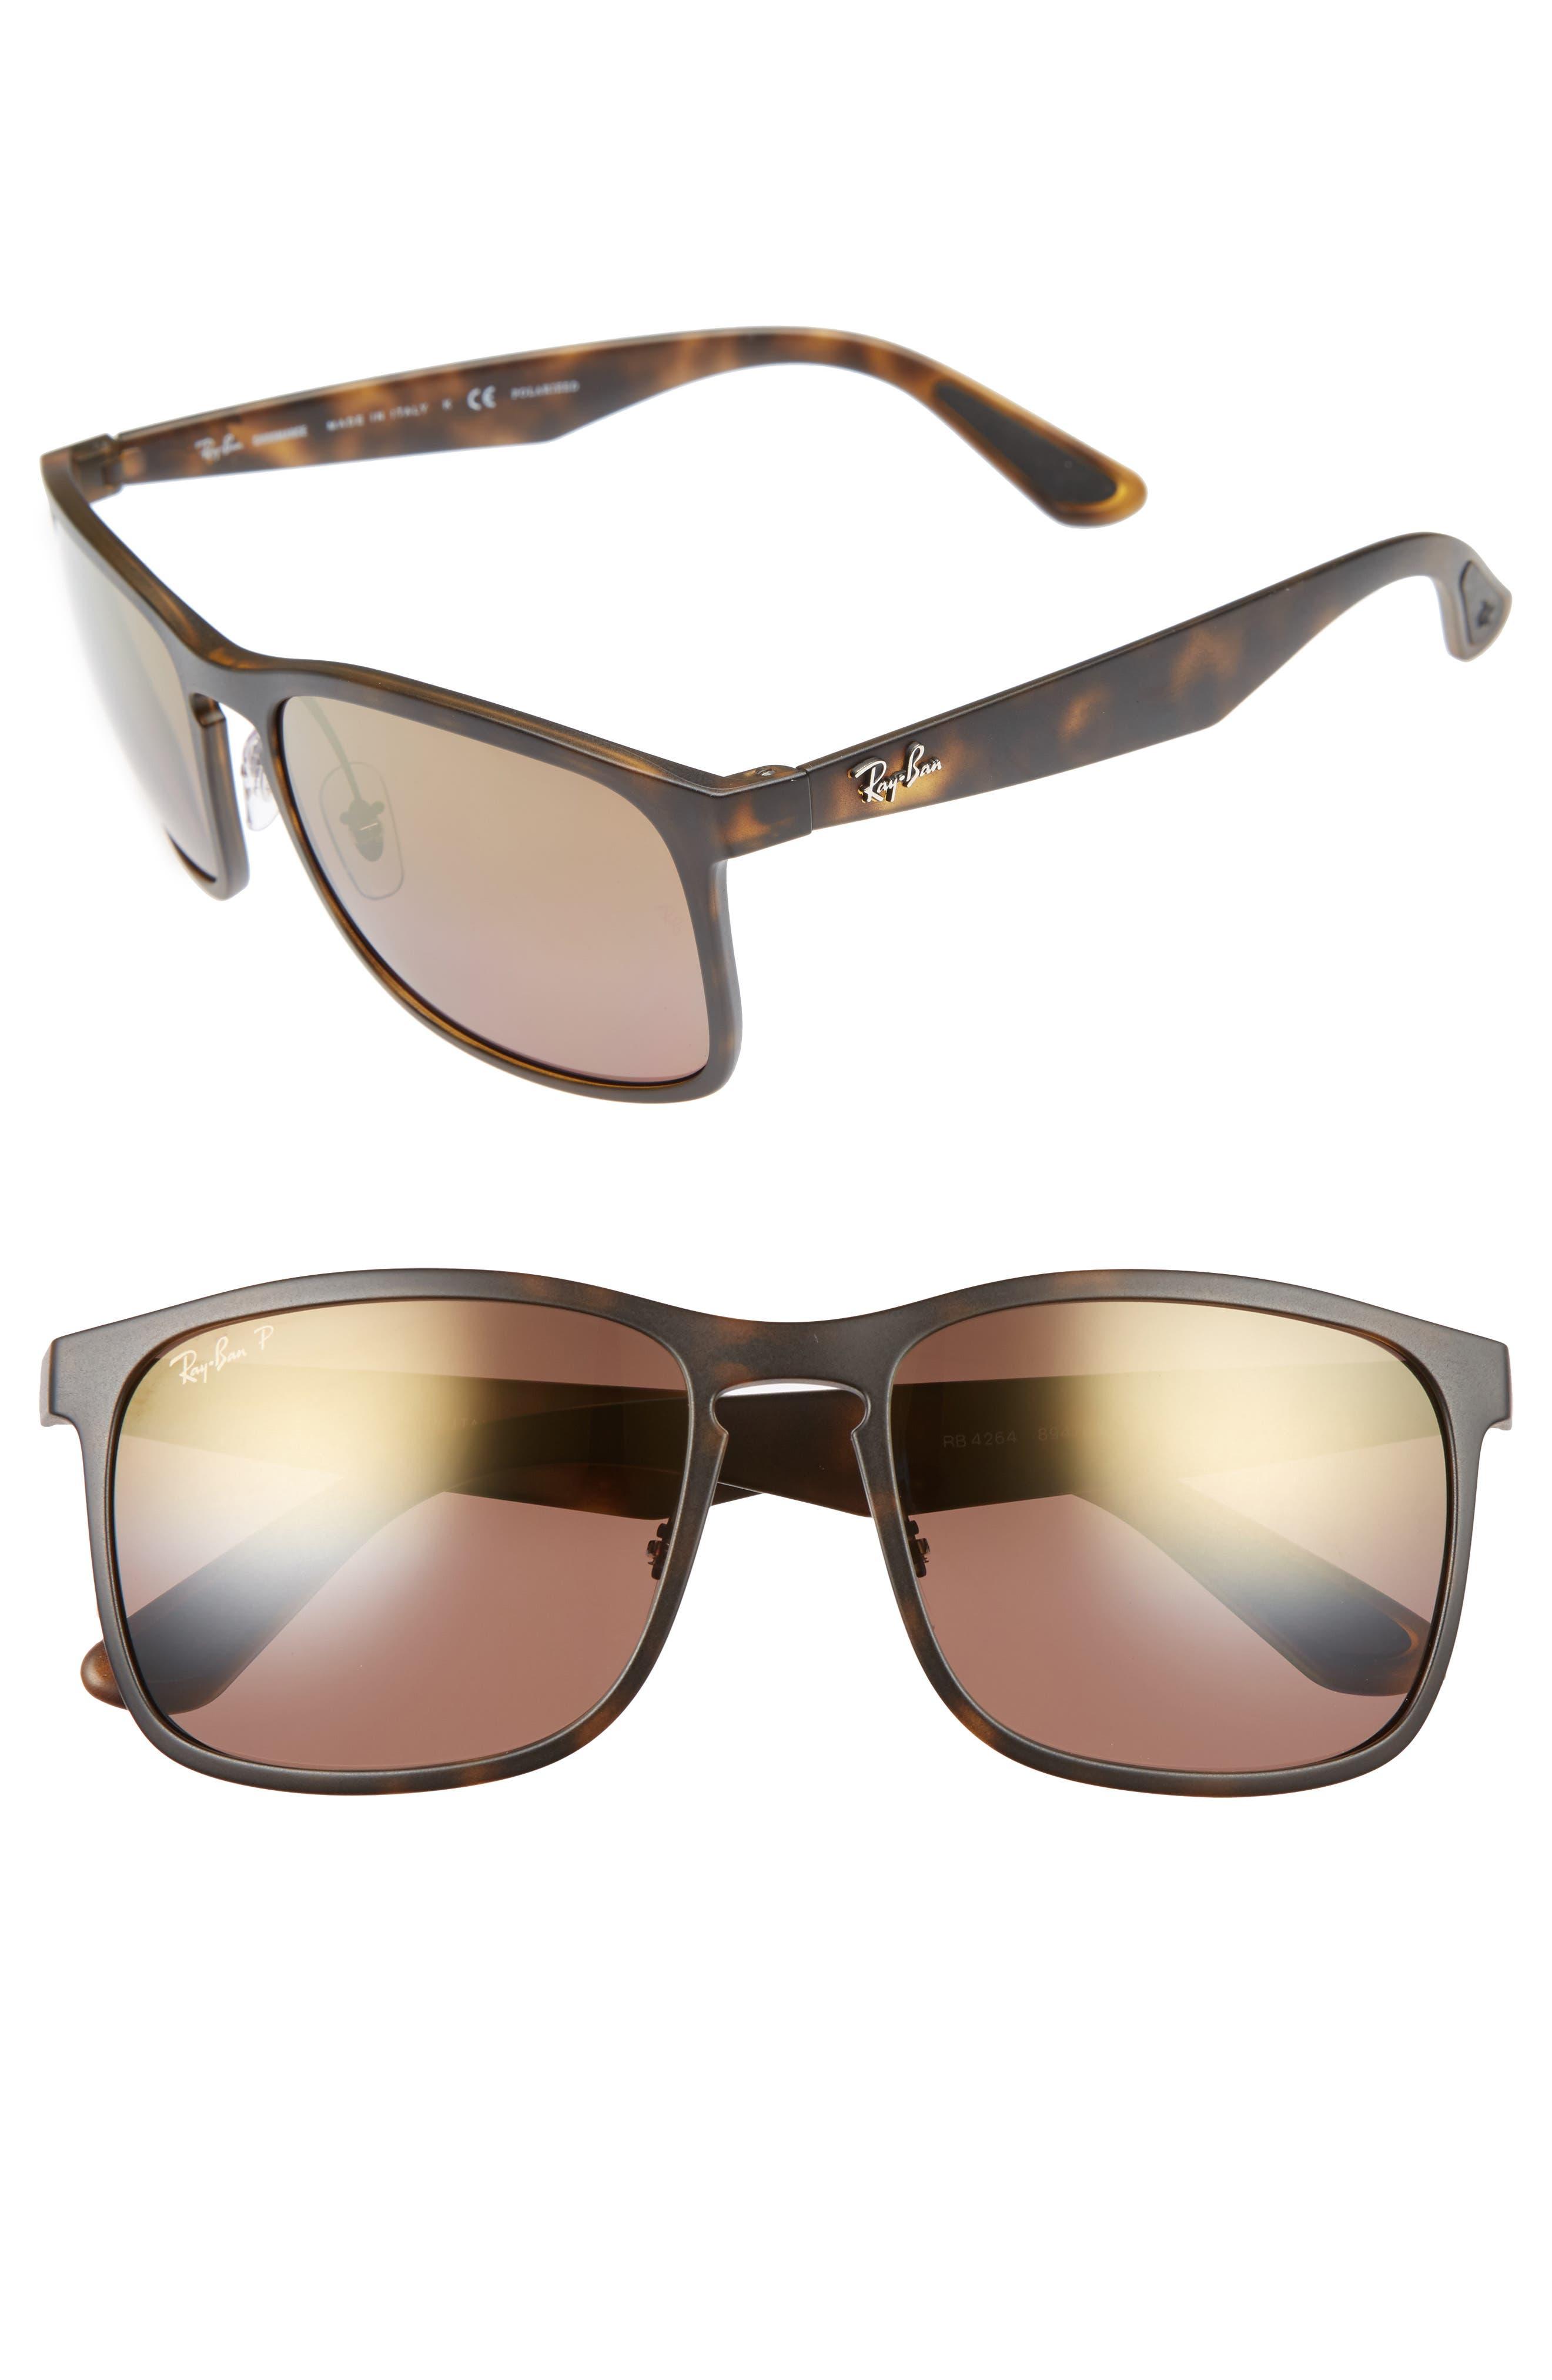 Ray-Ban 5m Chromance Sunglasses -